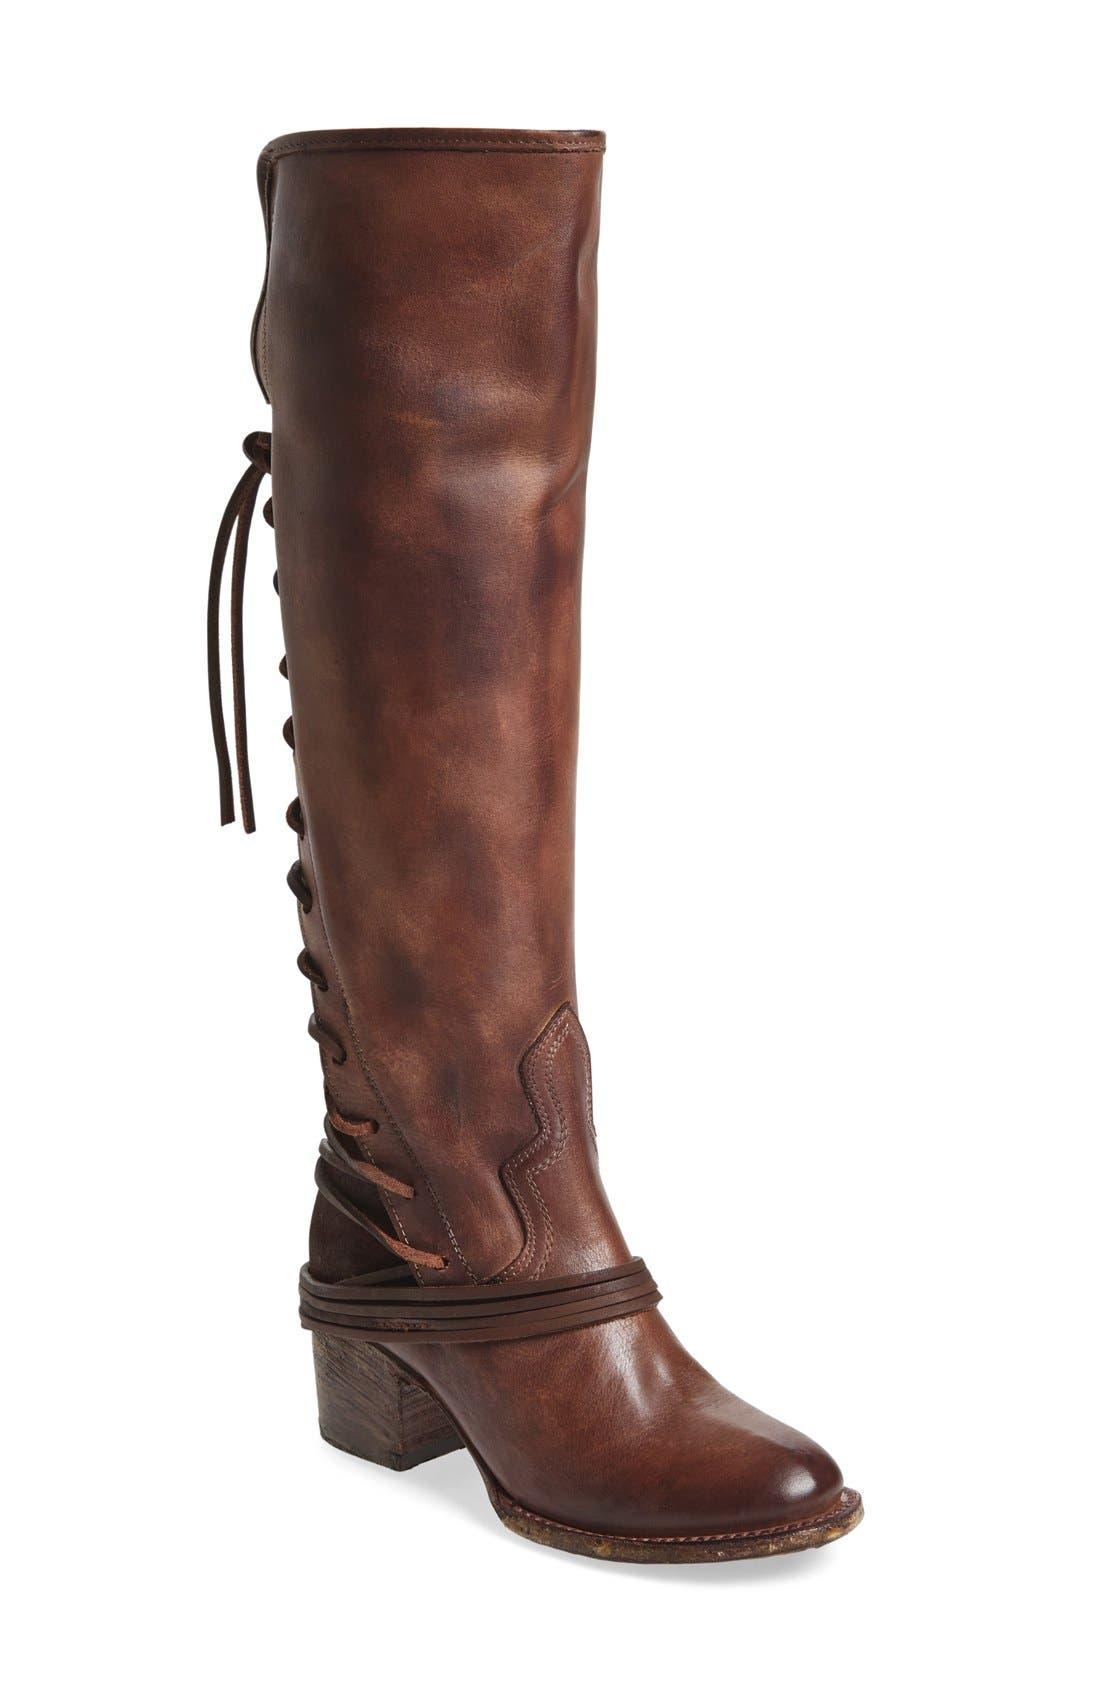 'Coal' Tall Leather Boot,                             Main thumbnail 1, color,                             PLUM